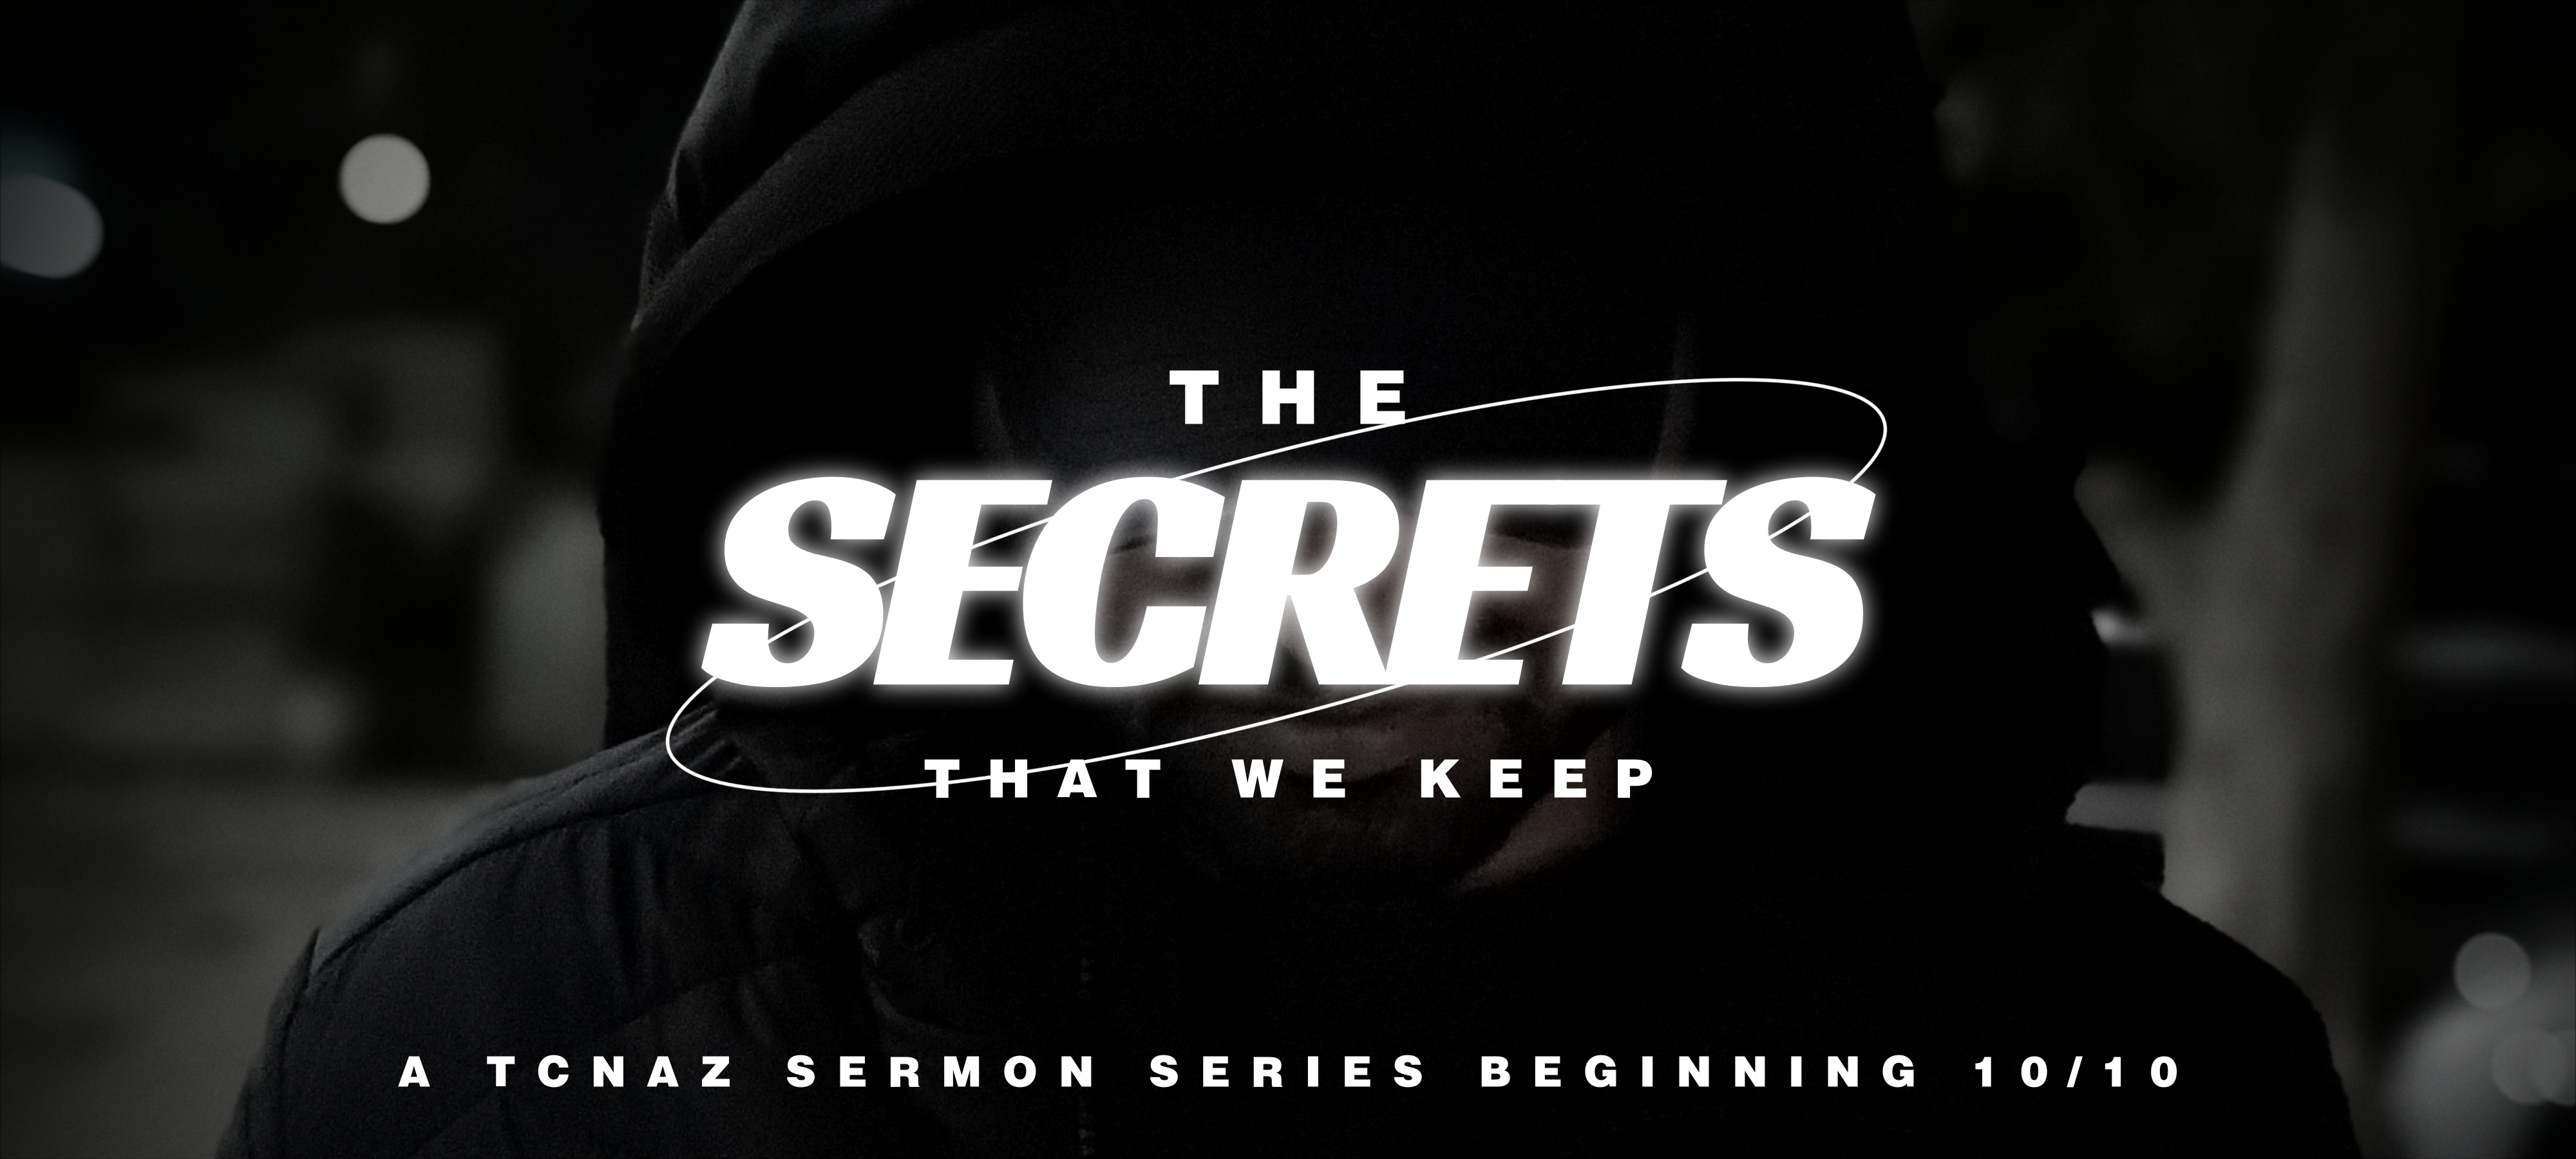 The_Secrets_that_we_keep_copy_